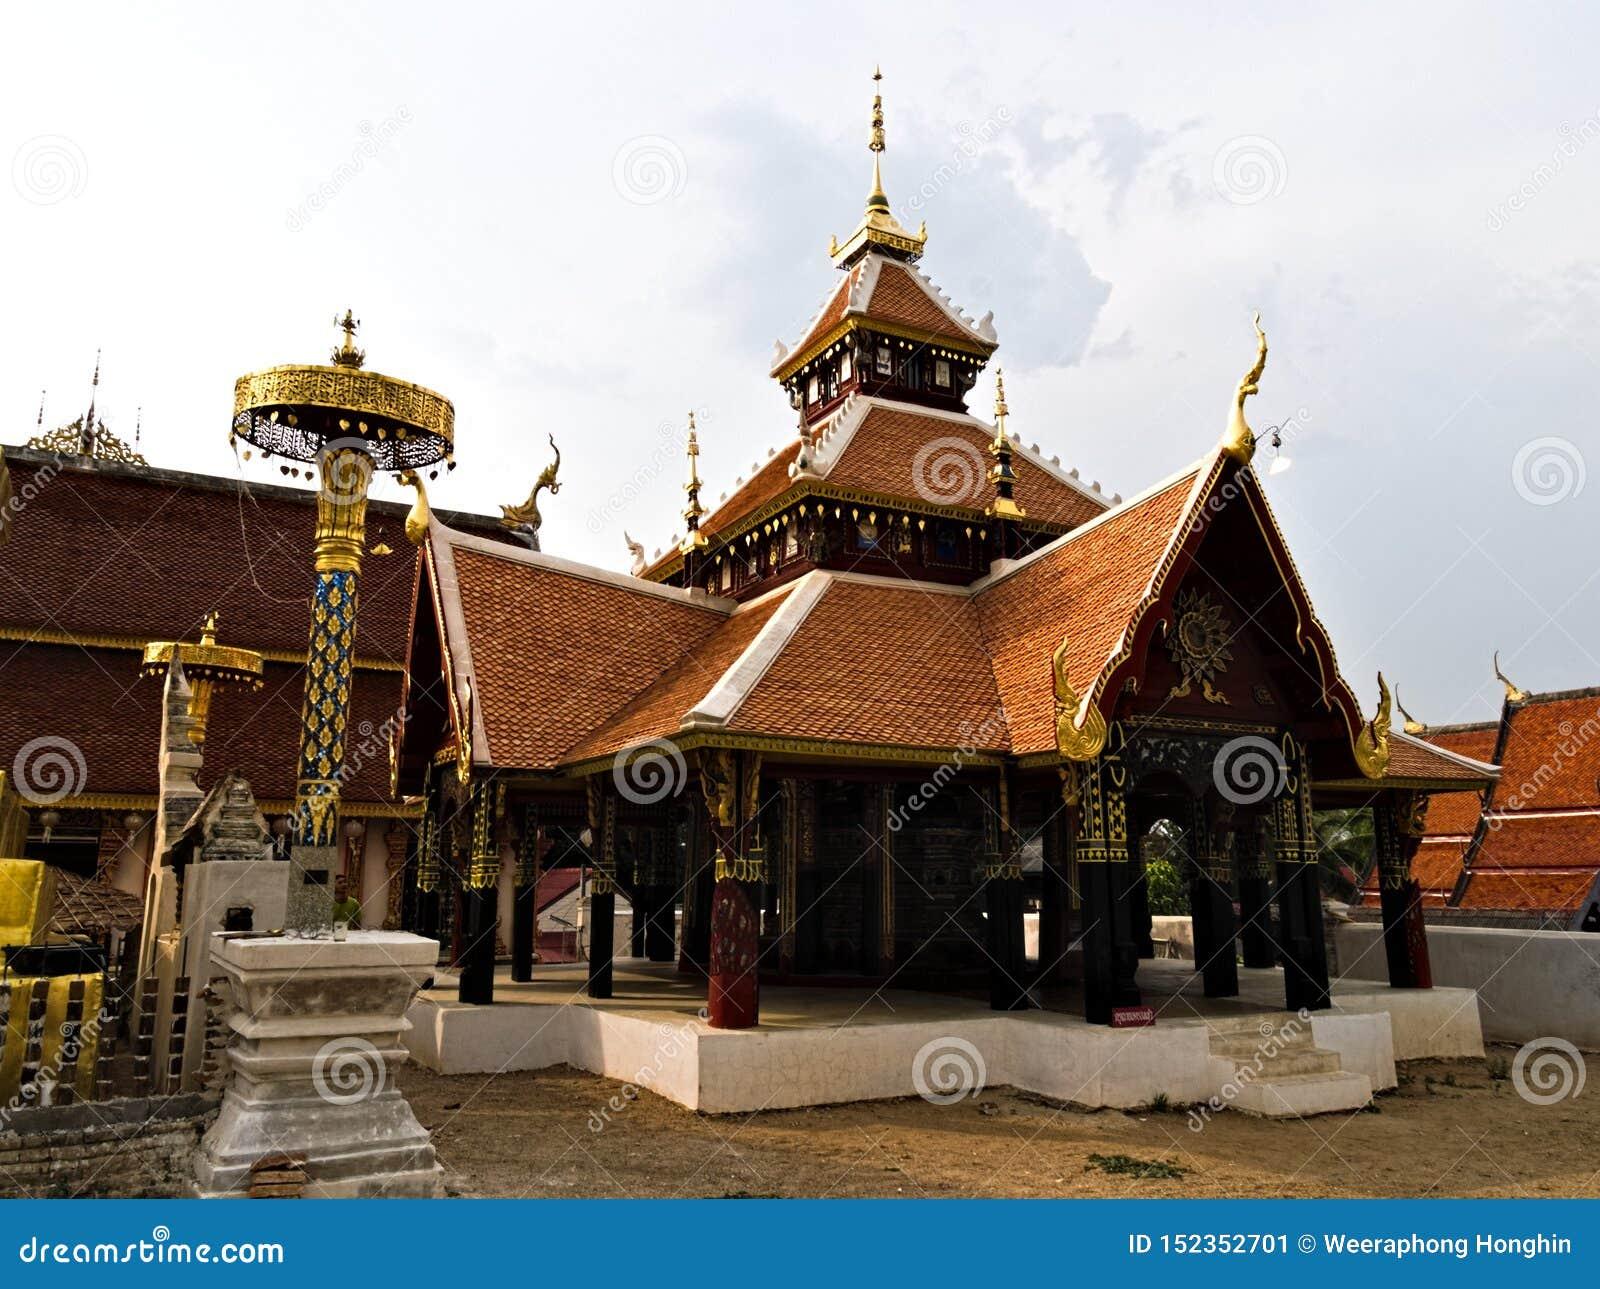 Wat-pong sanook nuea im lampang, Thailand